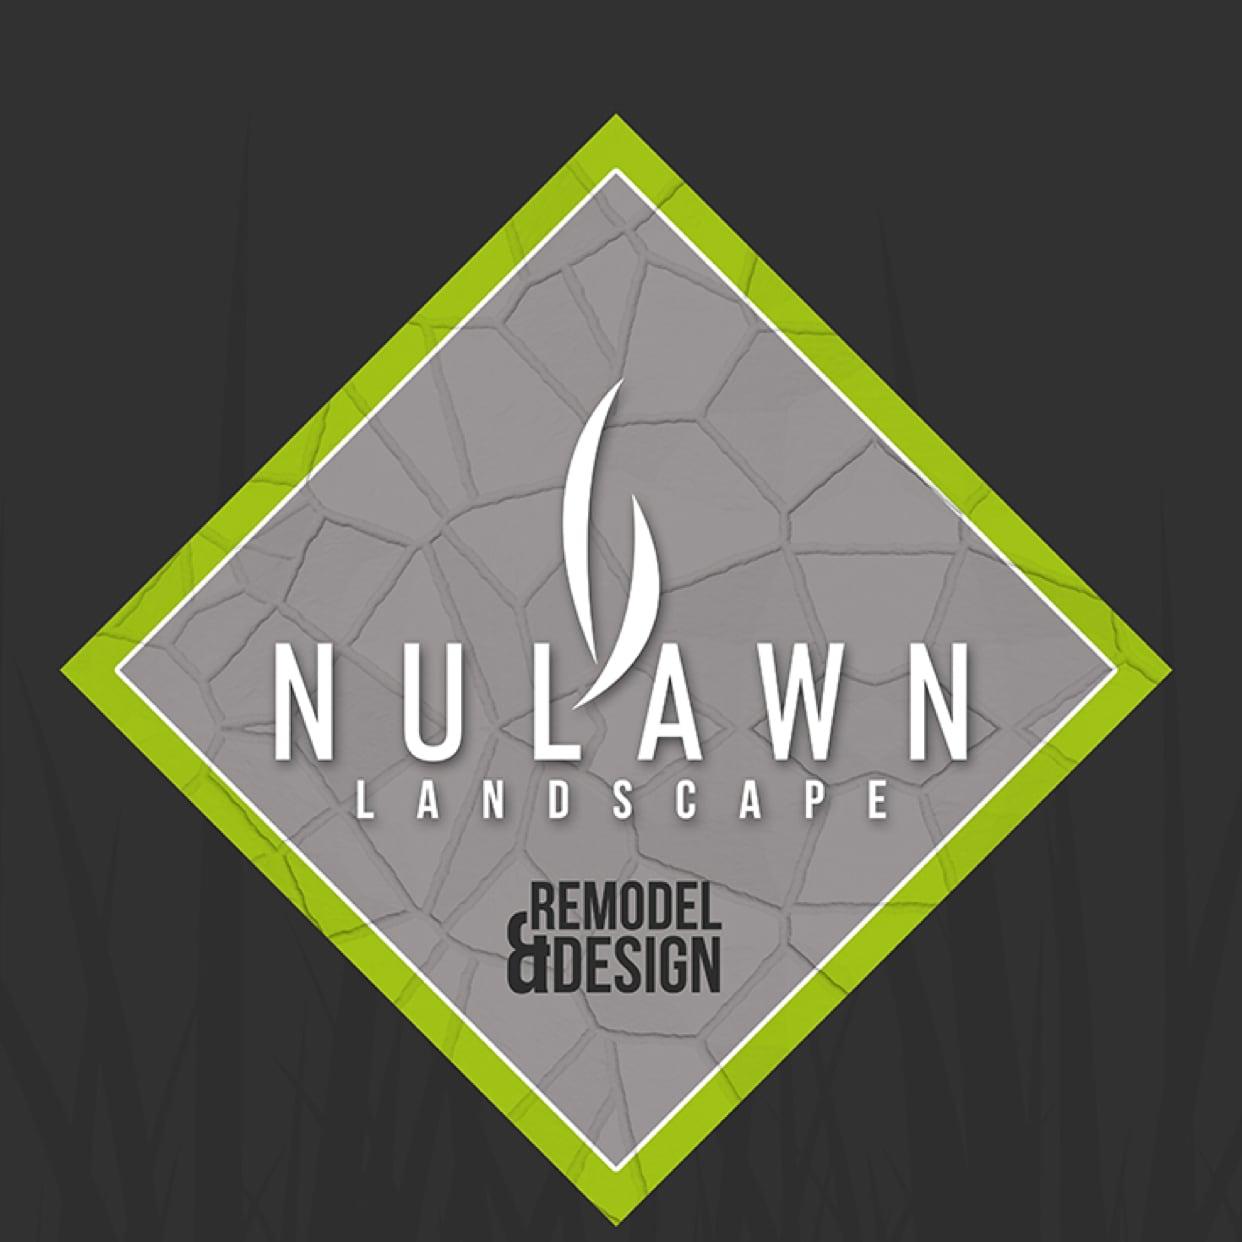 NULAWN Landscape Remodel and Design